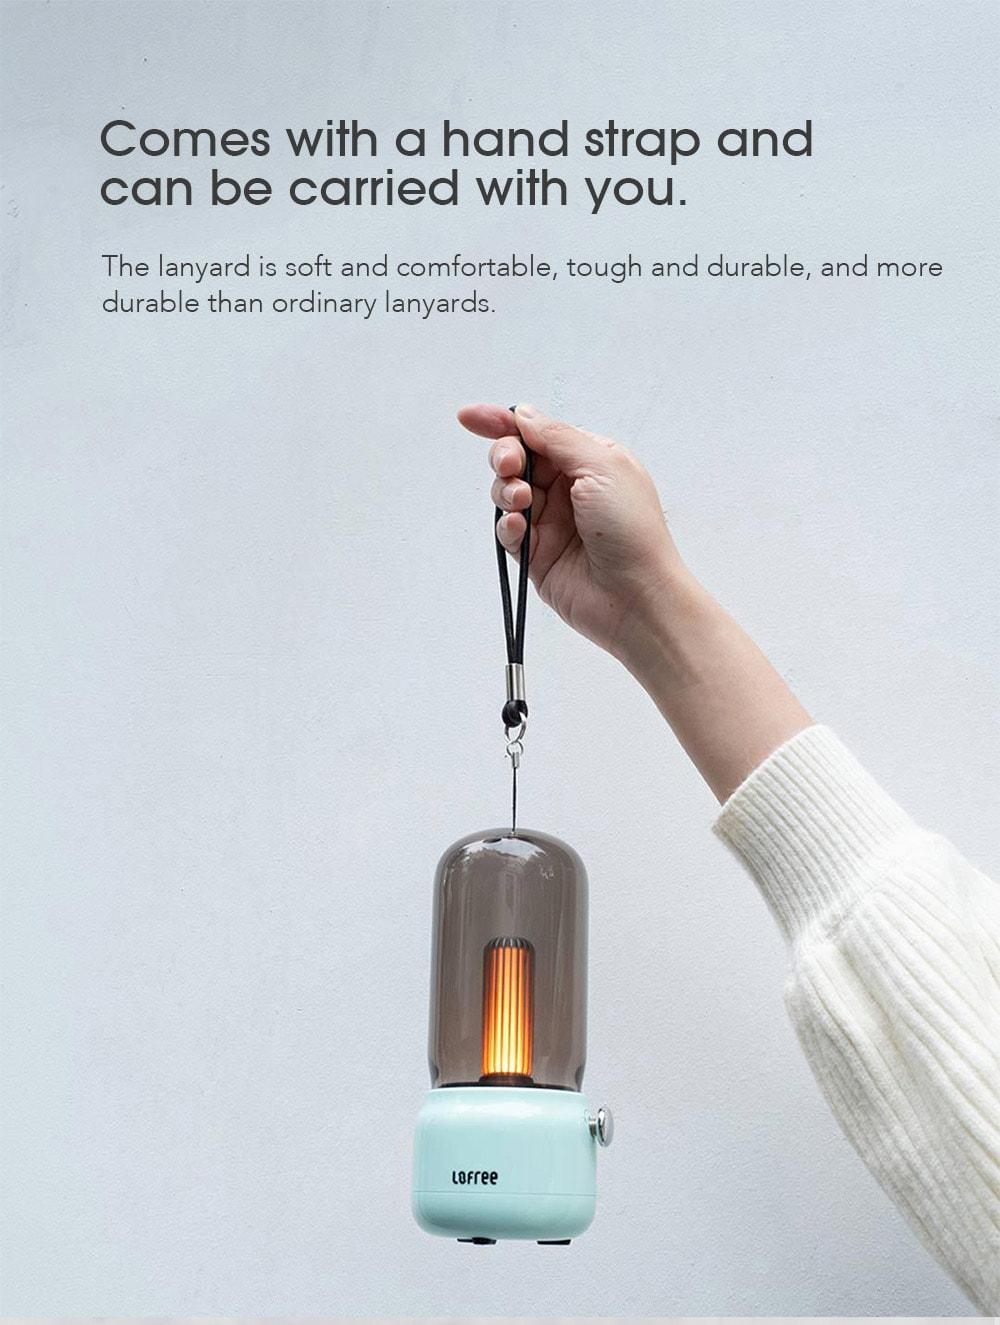 xiaomi lofree candly lamp